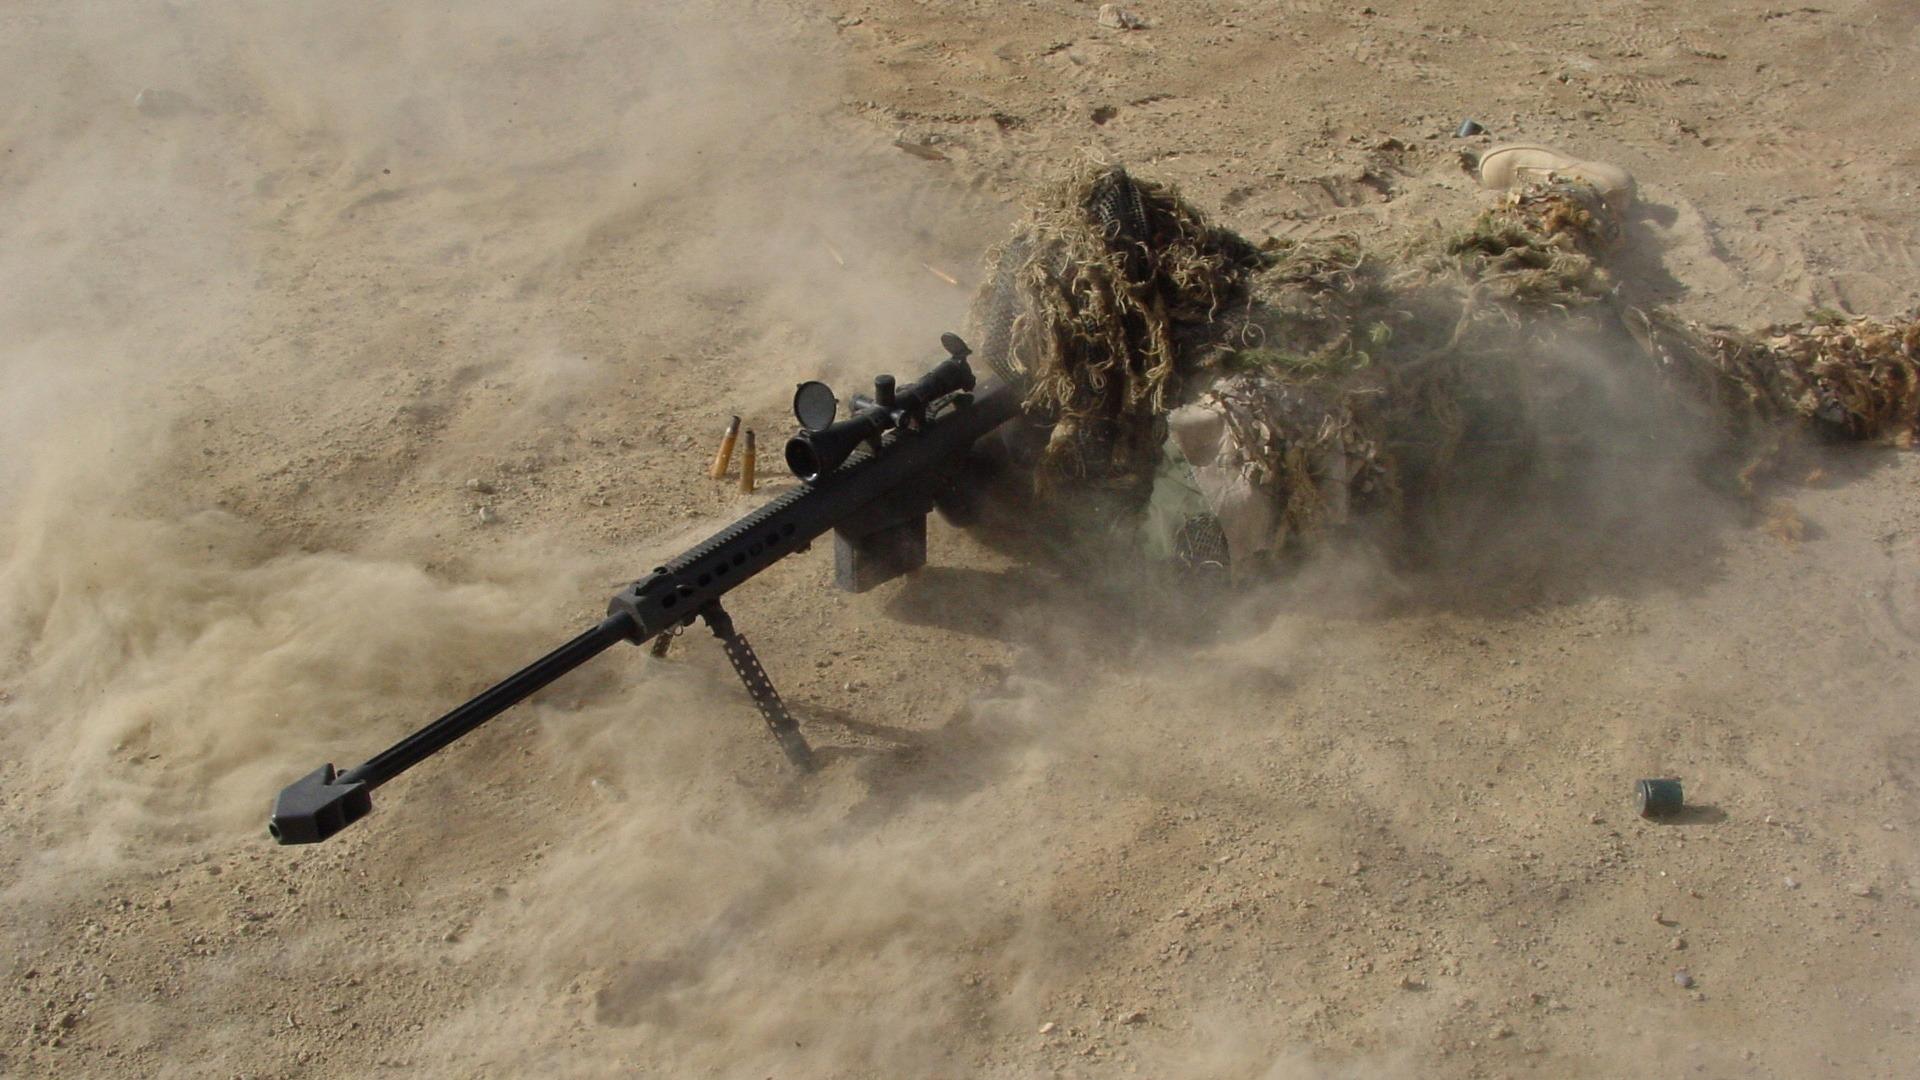 Sniper Camouflage Wallpaper 1920x1080 Sniper Camouflage Barrett 1920x1080